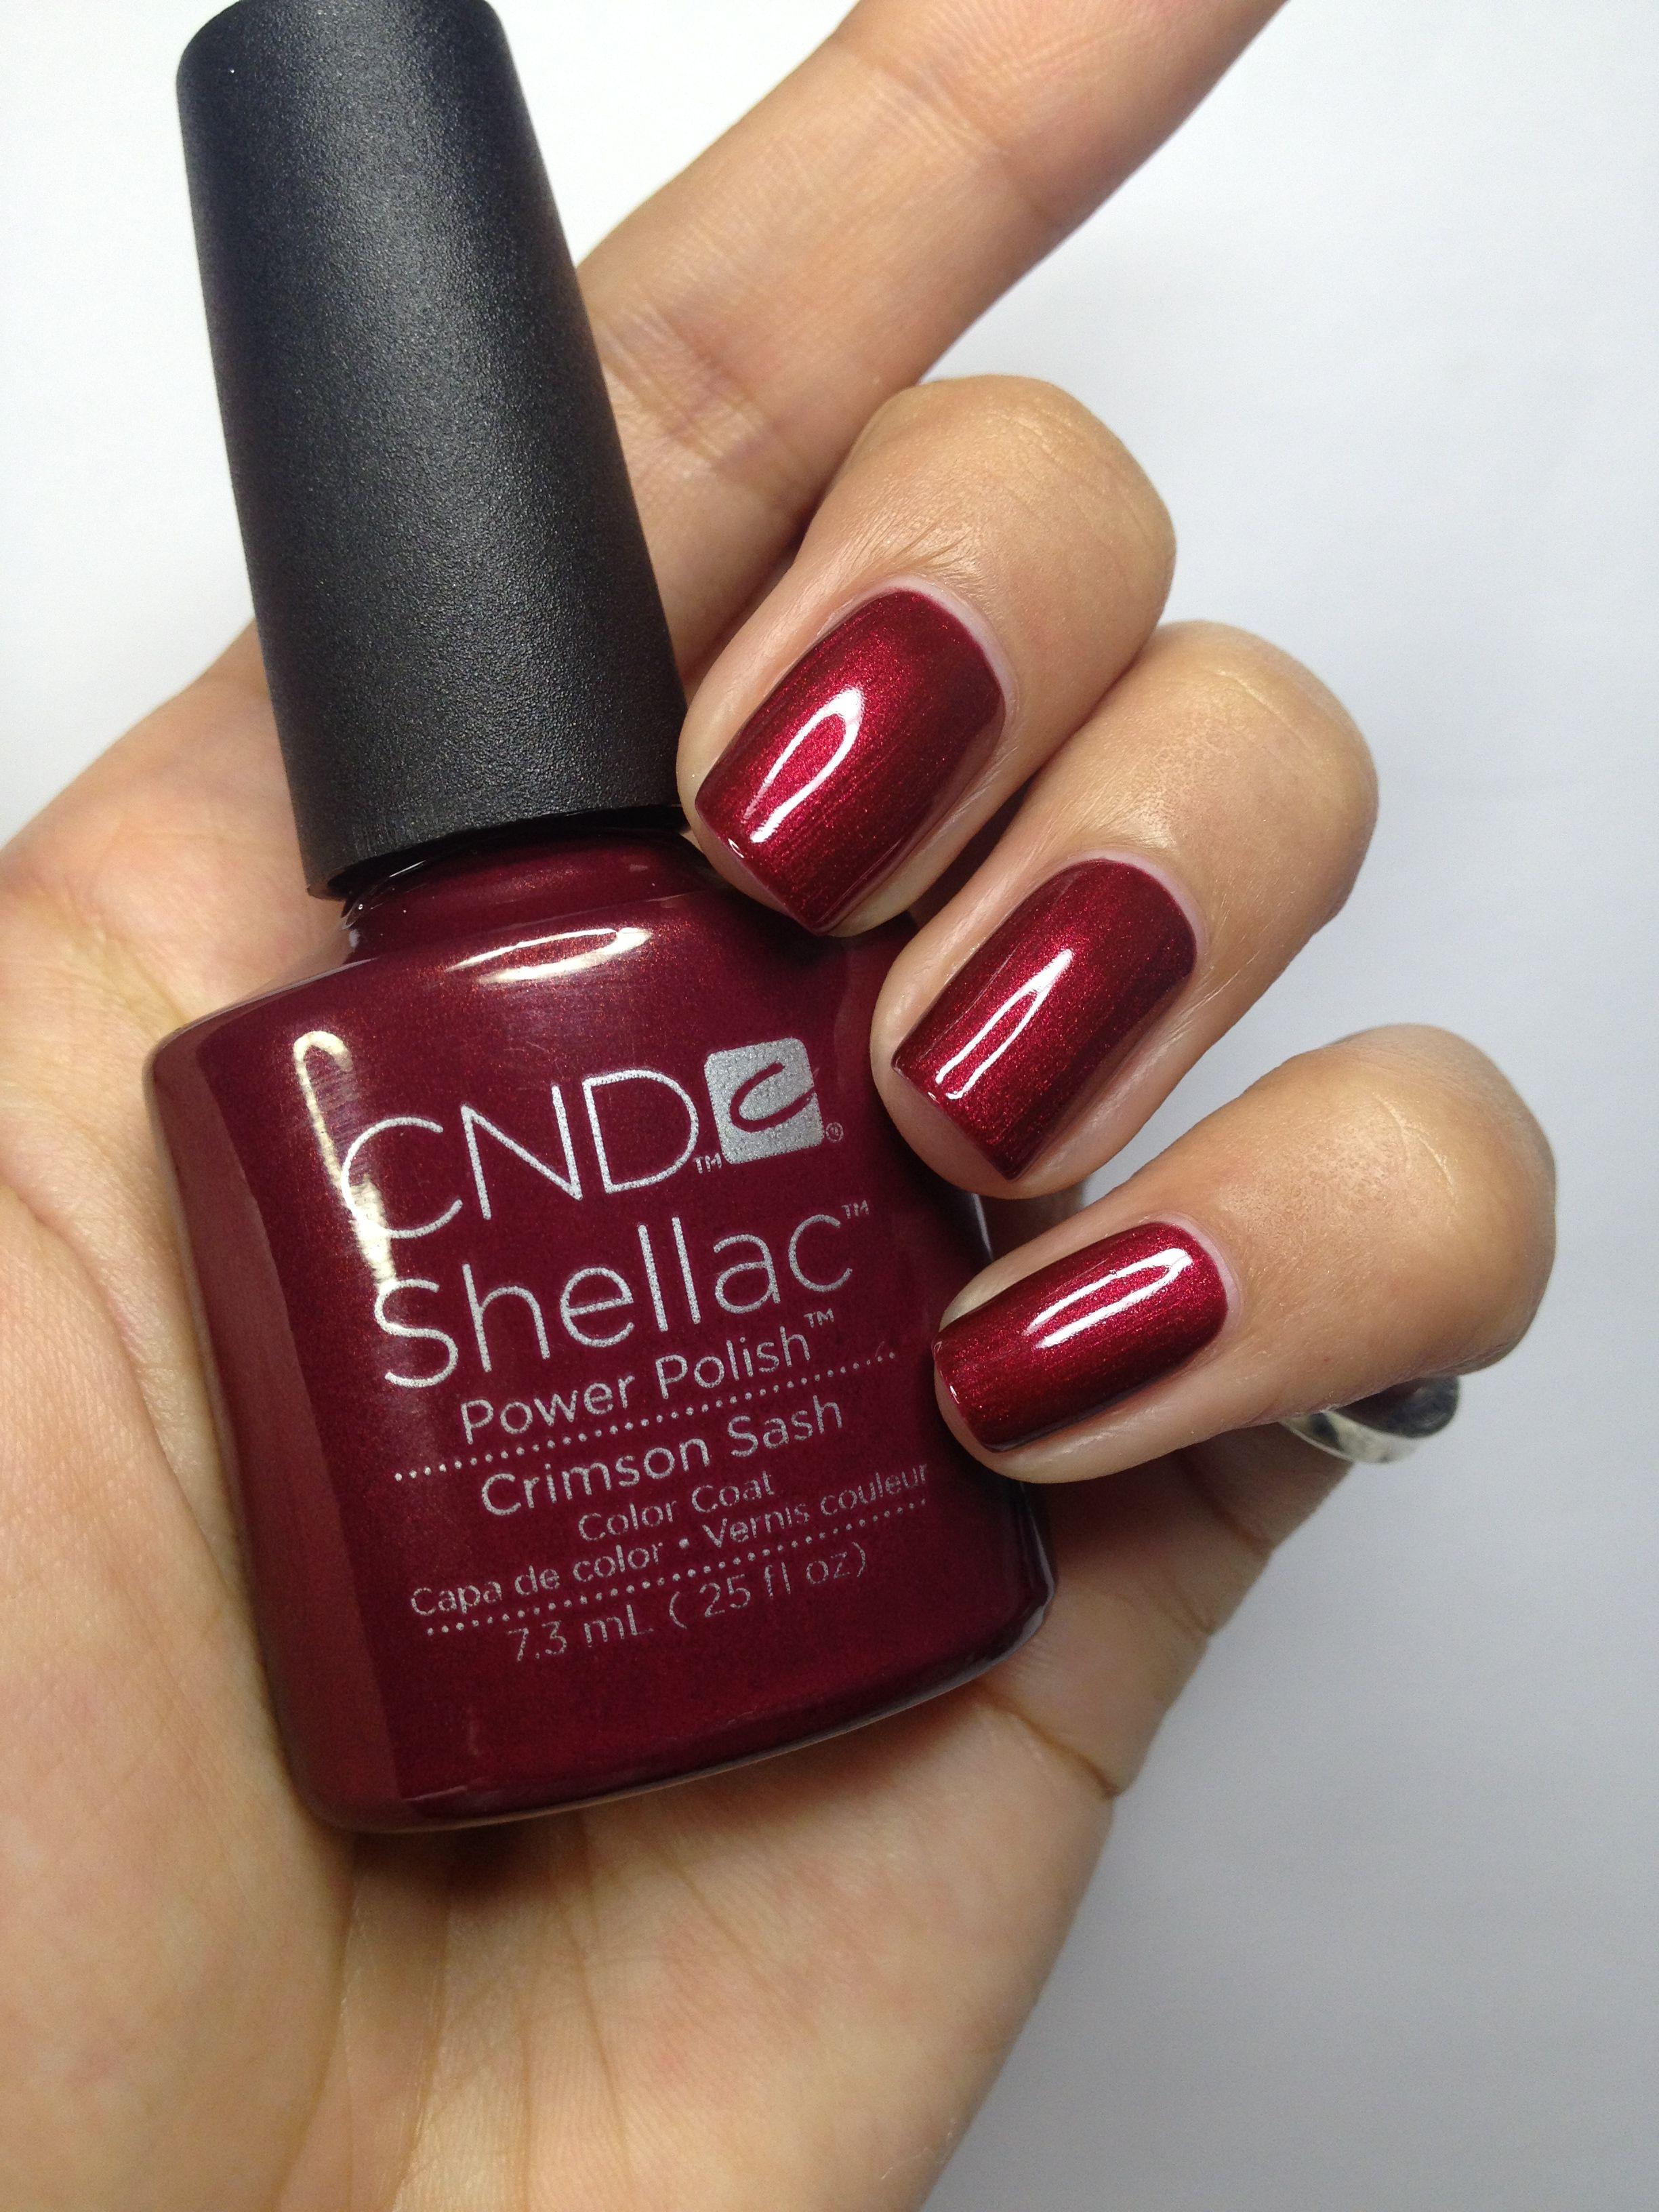 CND Shellac2014 | CND | Pinterest | Autumn nails, Autumn and Shellac ...